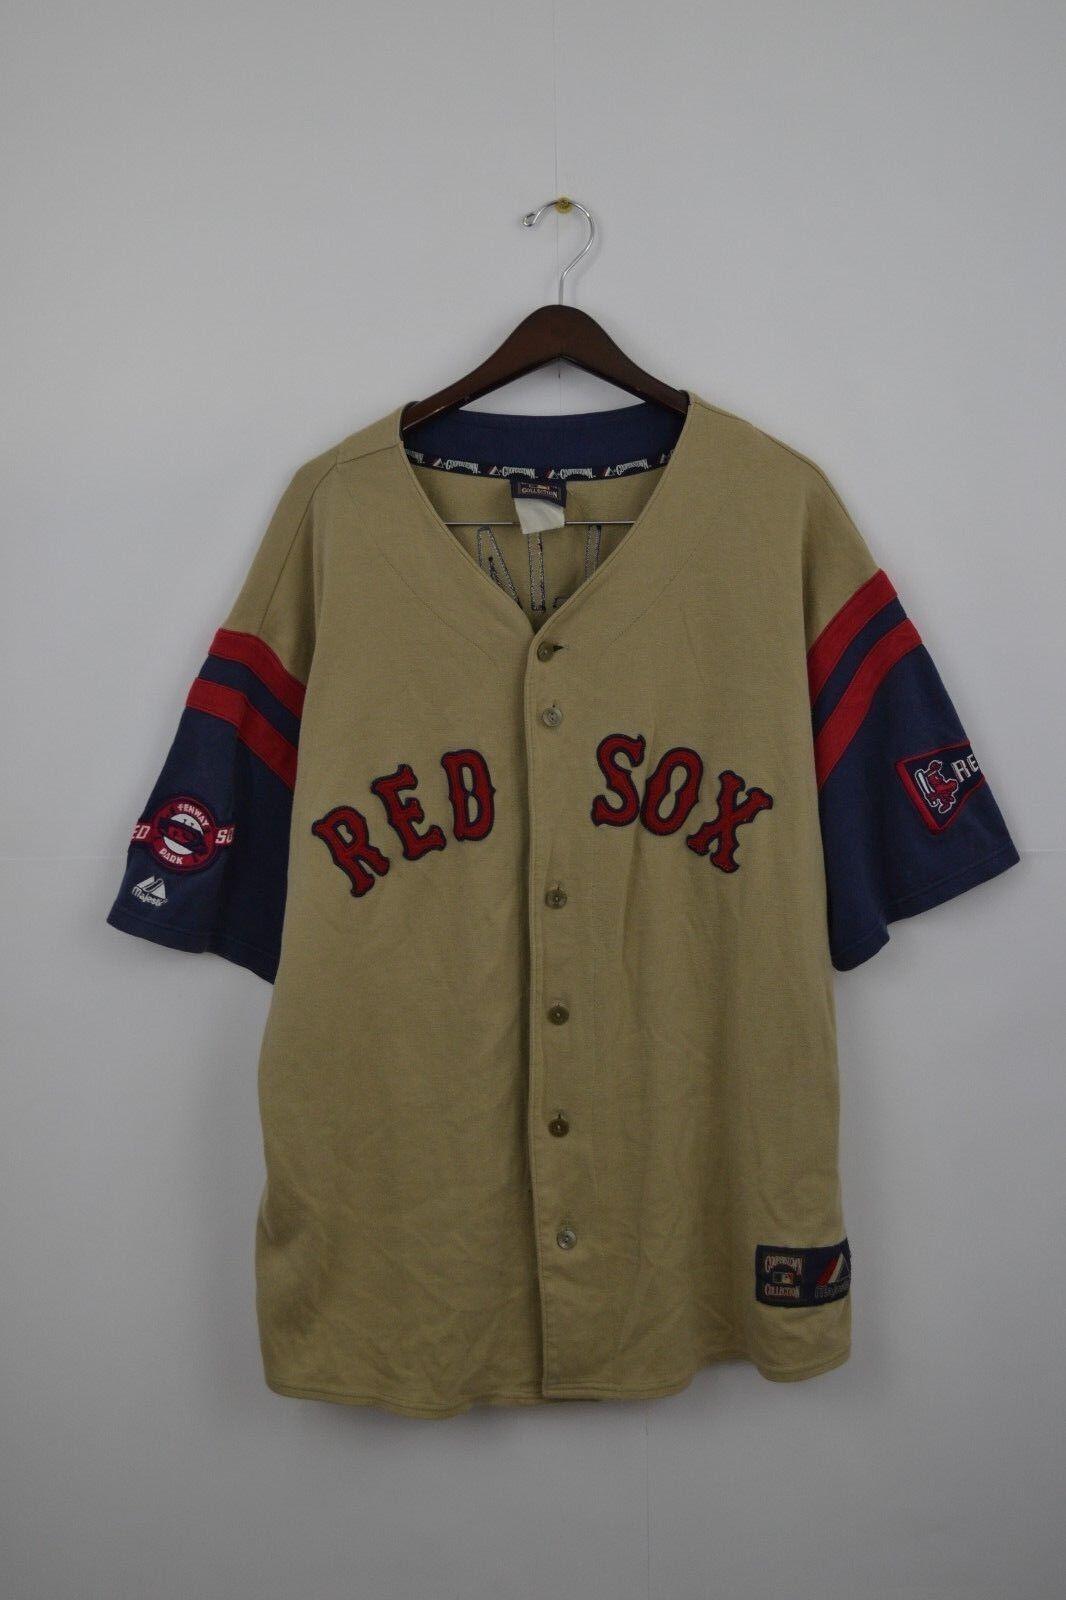 RARE williams 9 red sox majestic baseball jersey shirt vintage